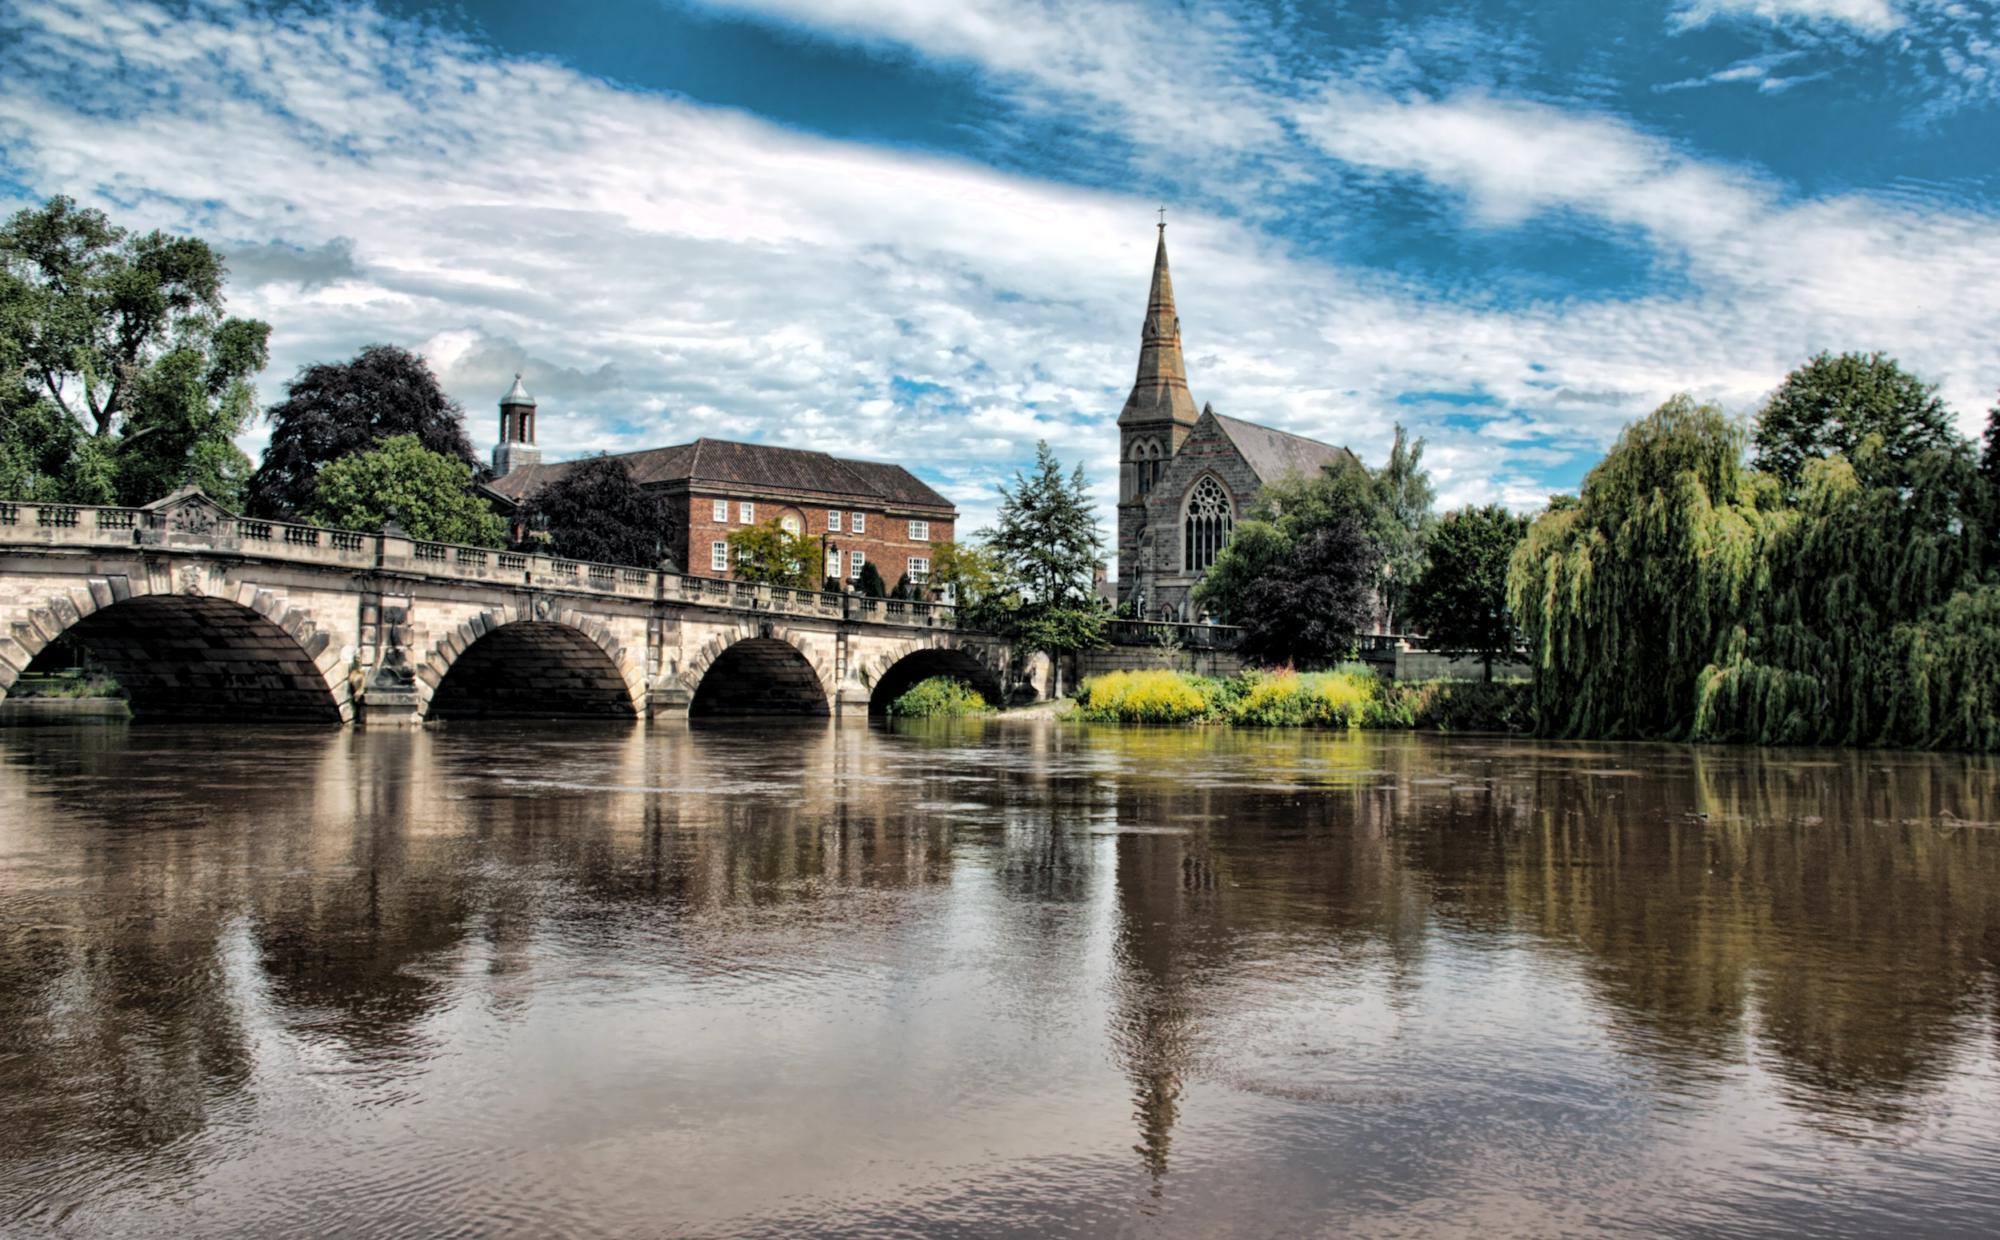 Shrewsbury Camping | Campsites in Shrewsbury, Shropshire